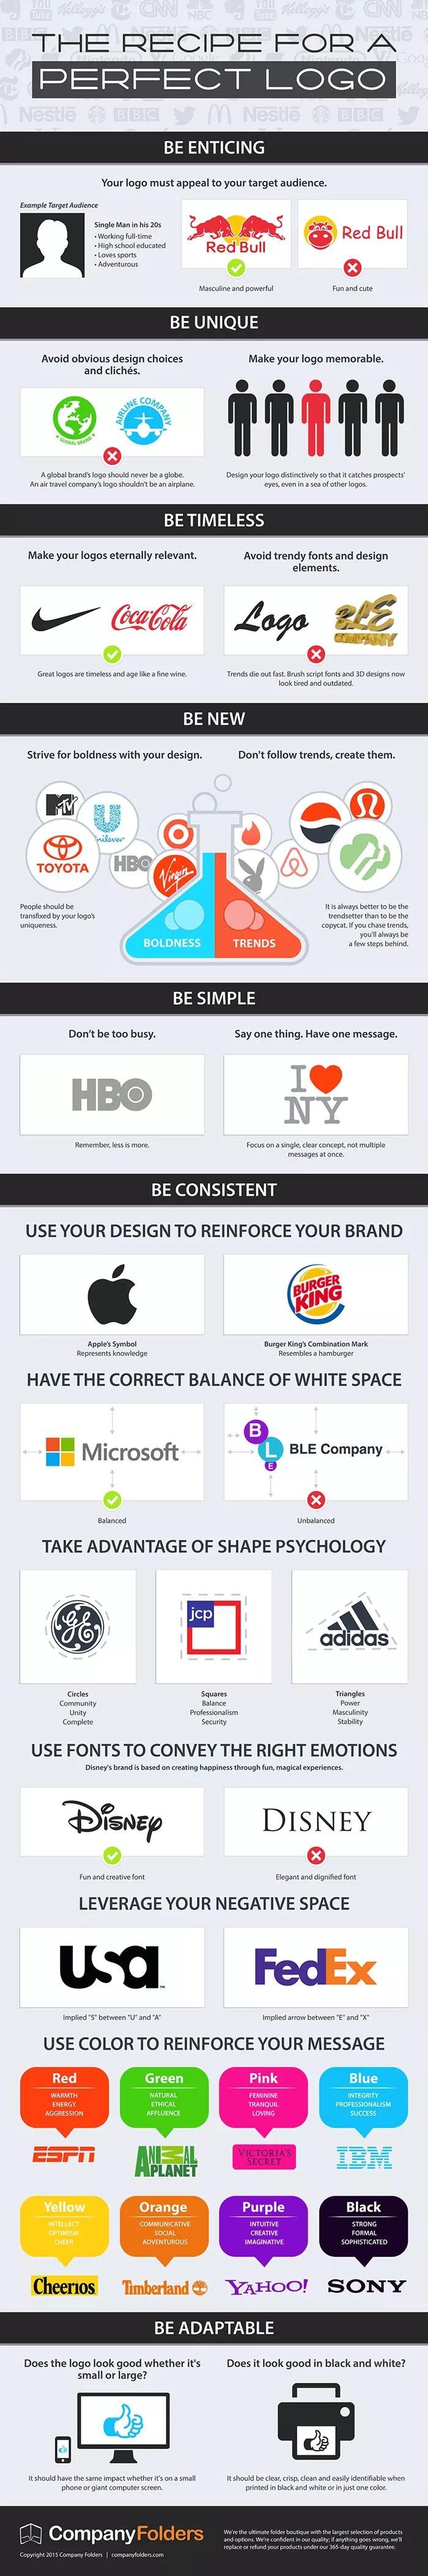 perfect-logo-design-infographic-700